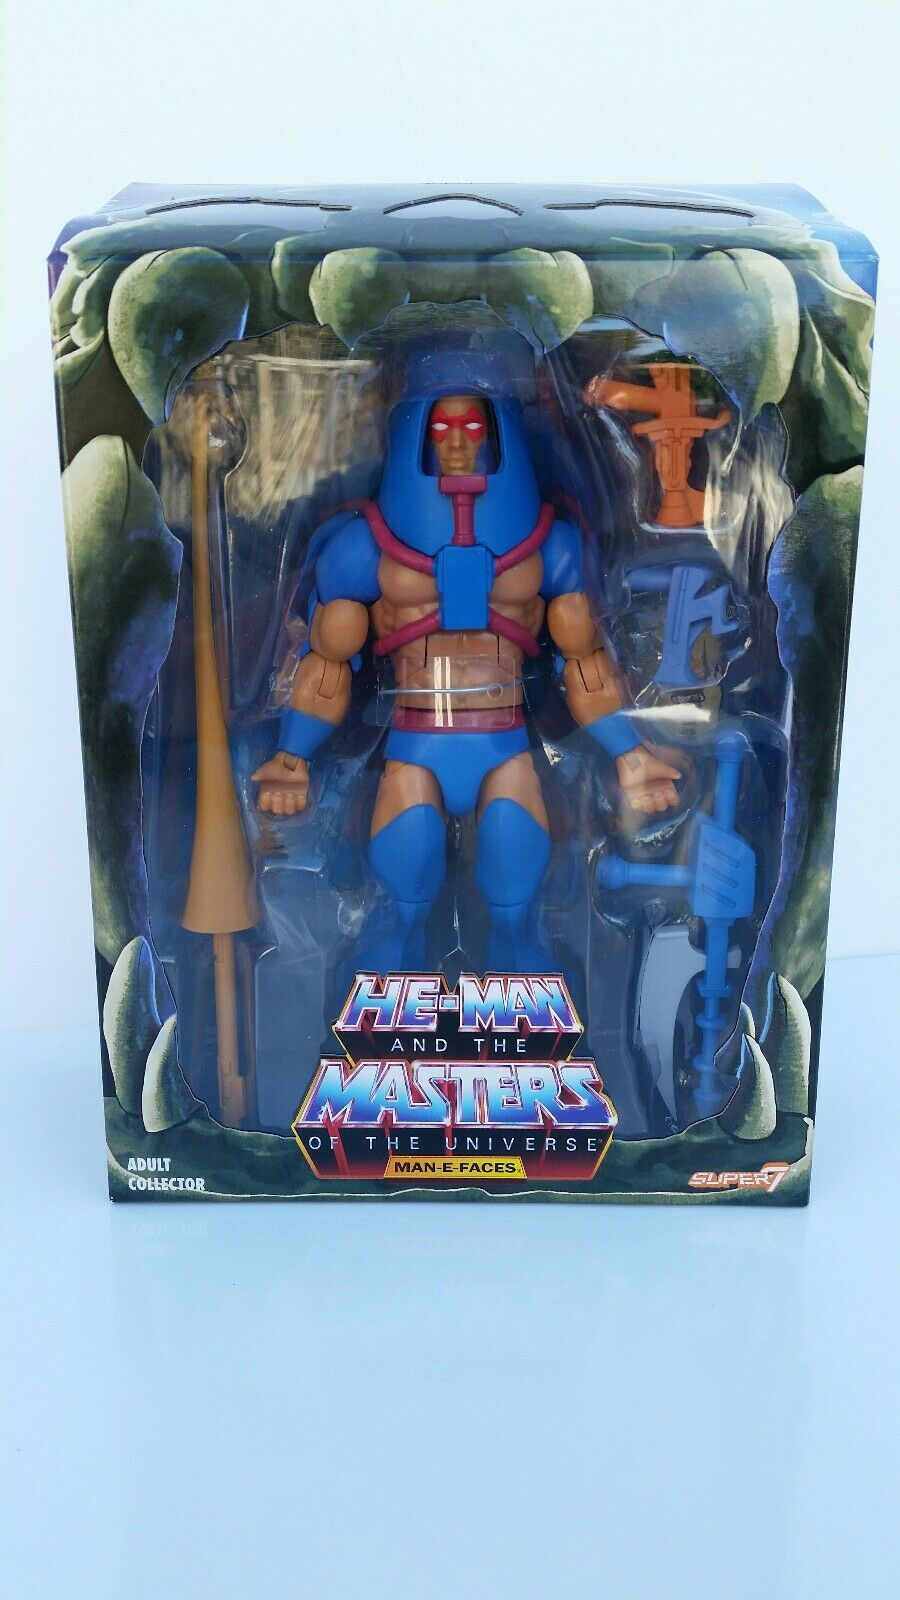 He-man motu 2018 super 7 man-e-faces 7  action - figur - neu       misb